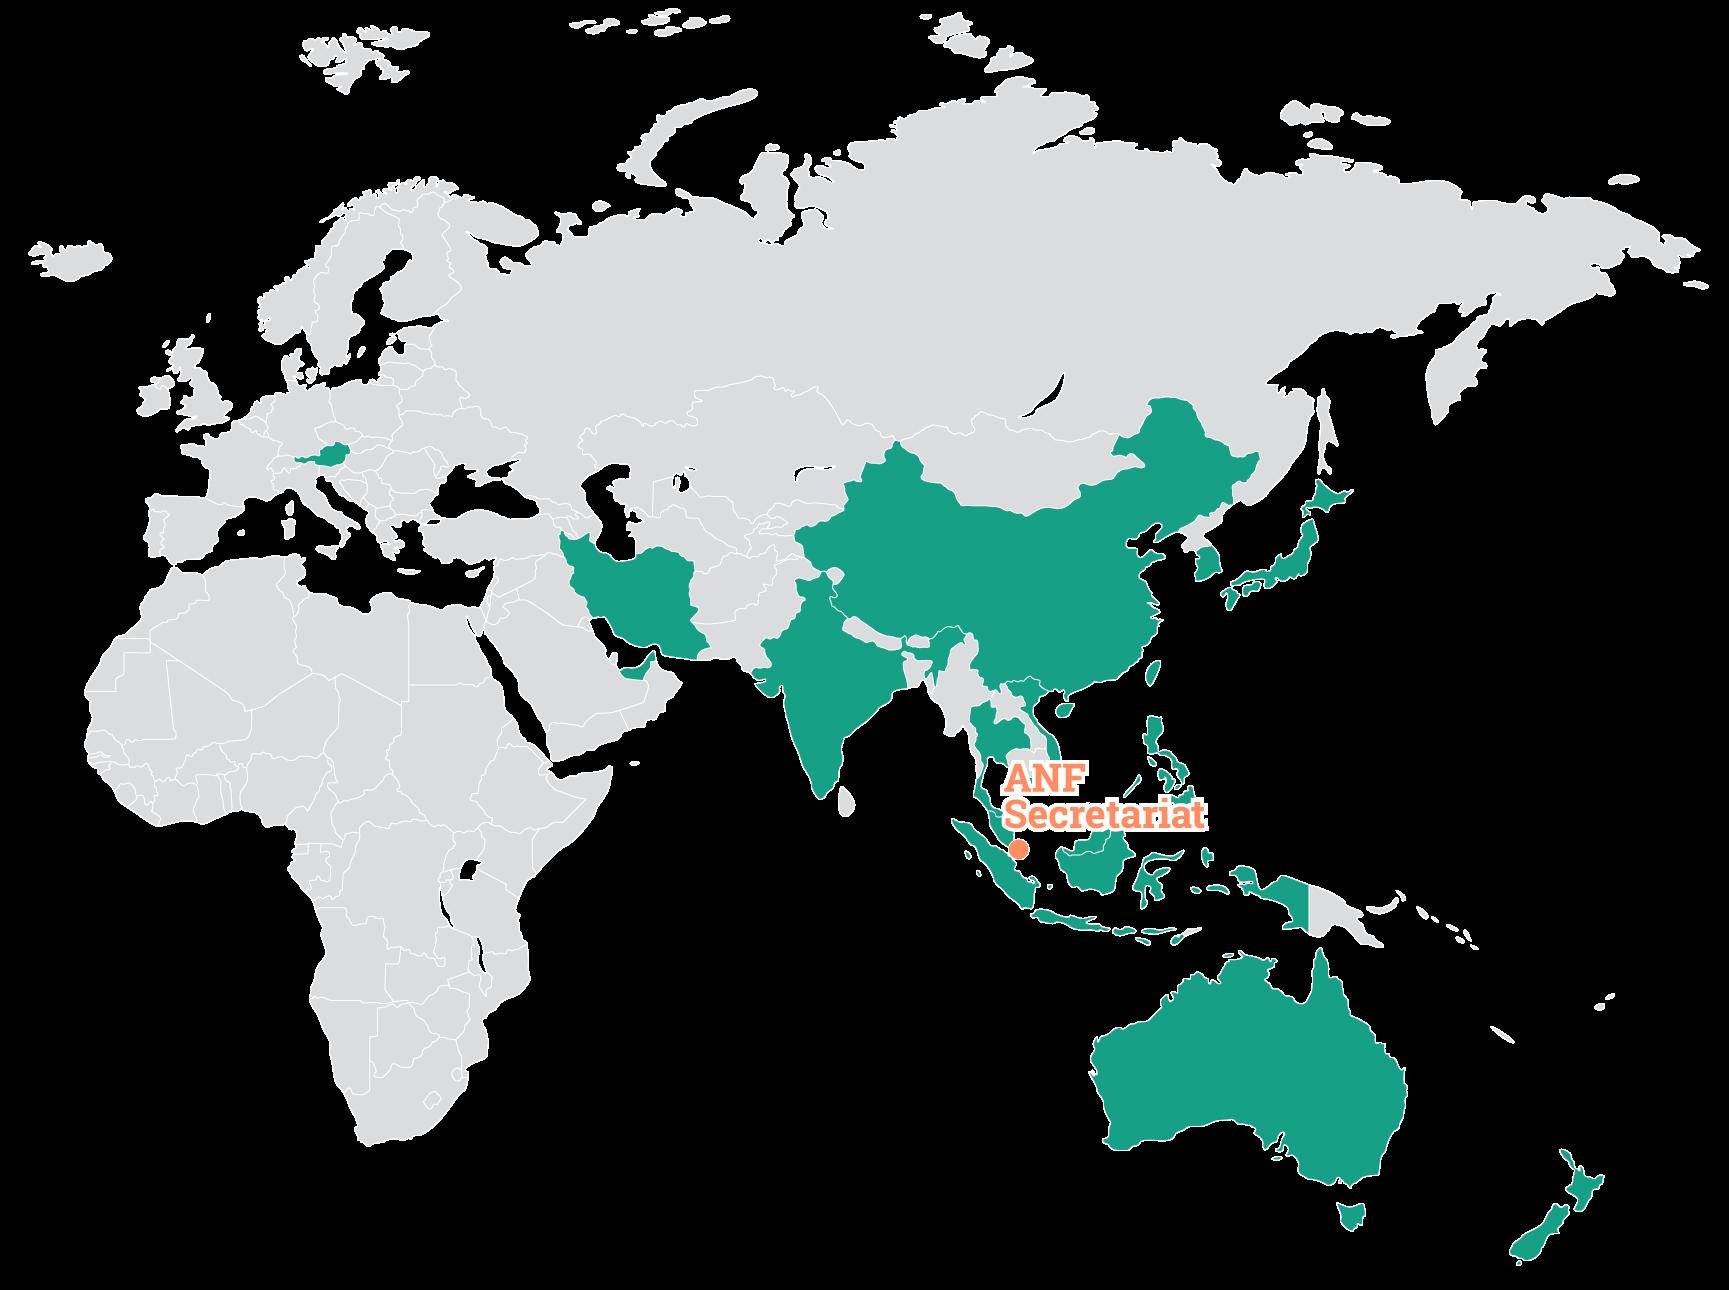 ANF member network world map